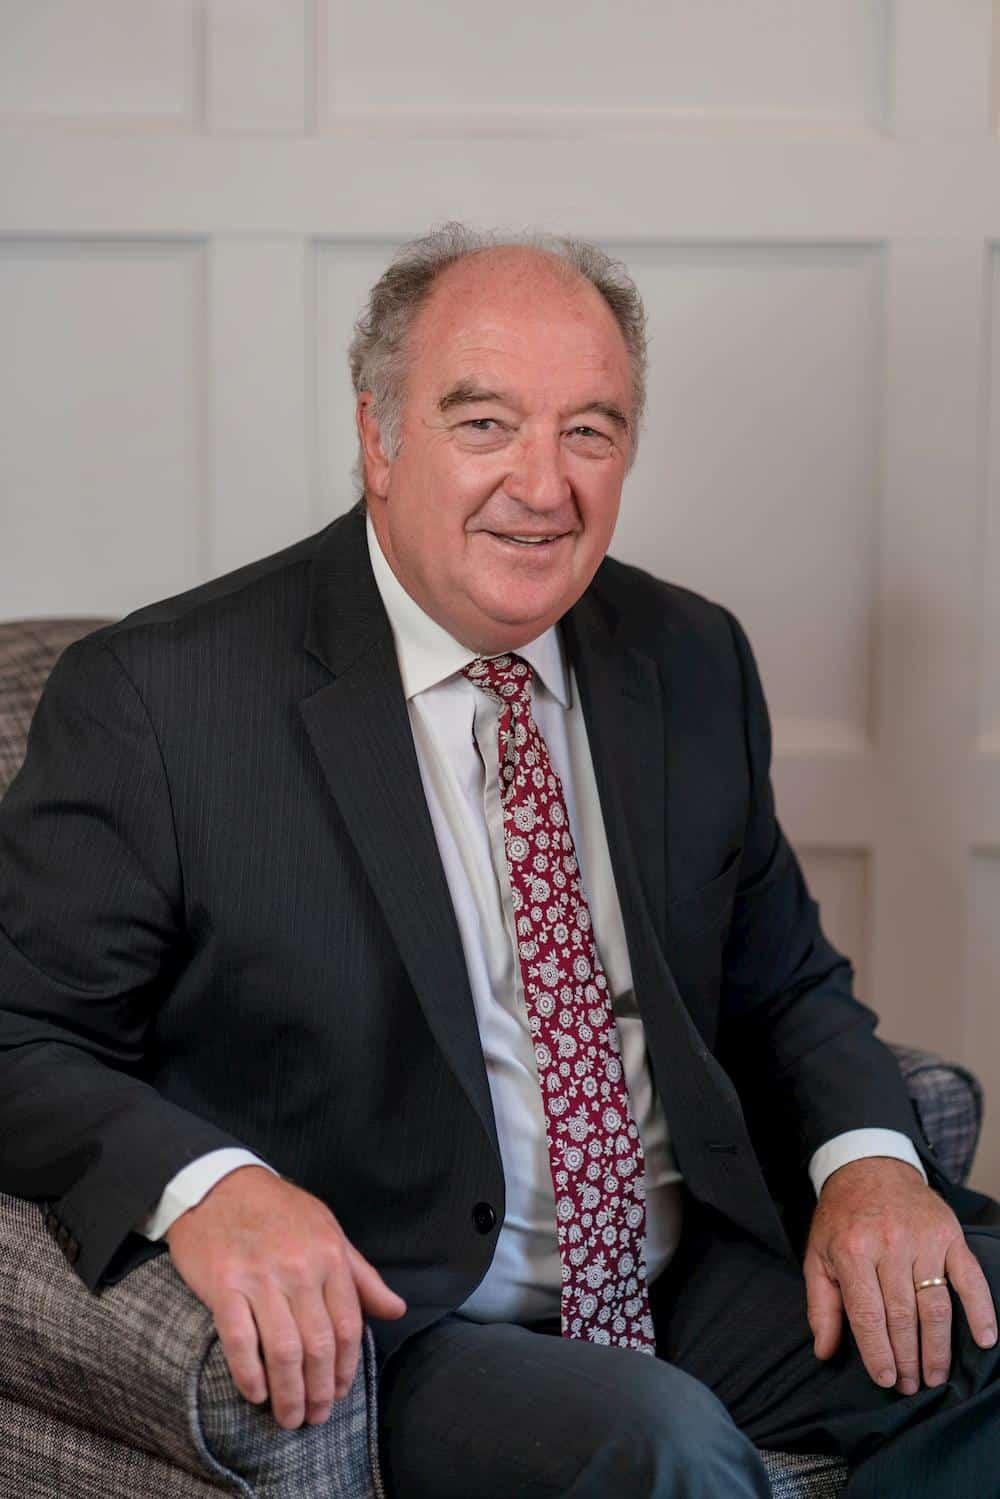 Portrait of Damian Egan - Board Member at Hobart City Mission